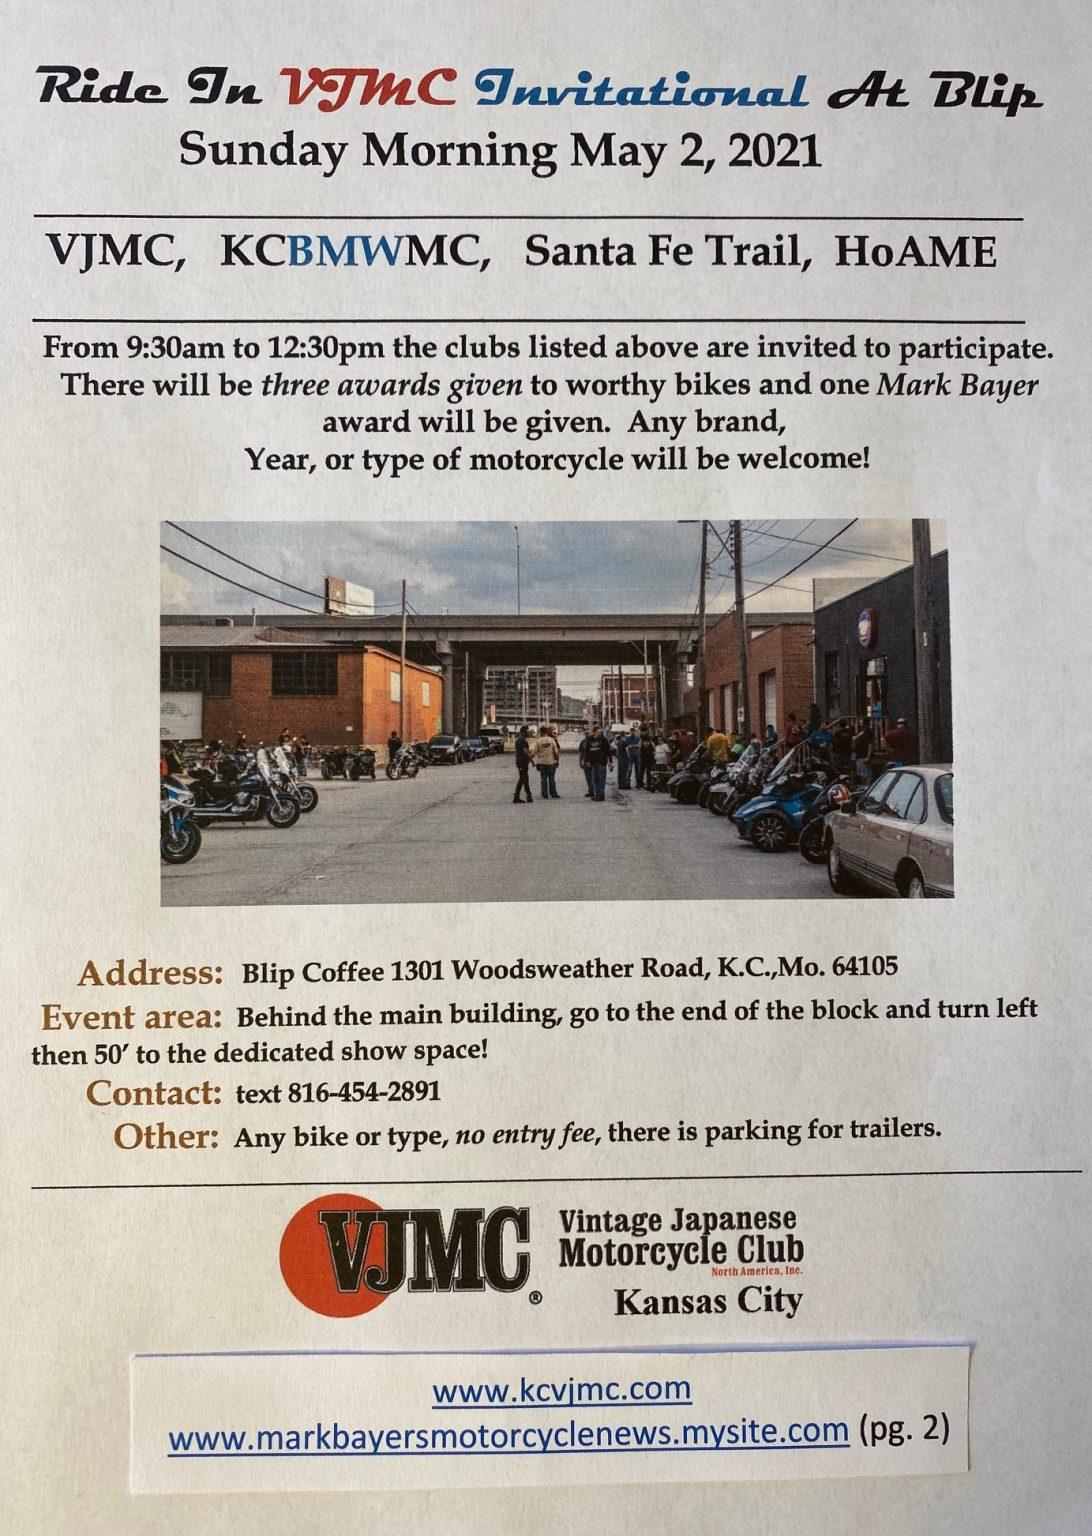 2021 Vjmc Invitational At Blip | Vintage Japanese Regarding 454 Calendar 2021